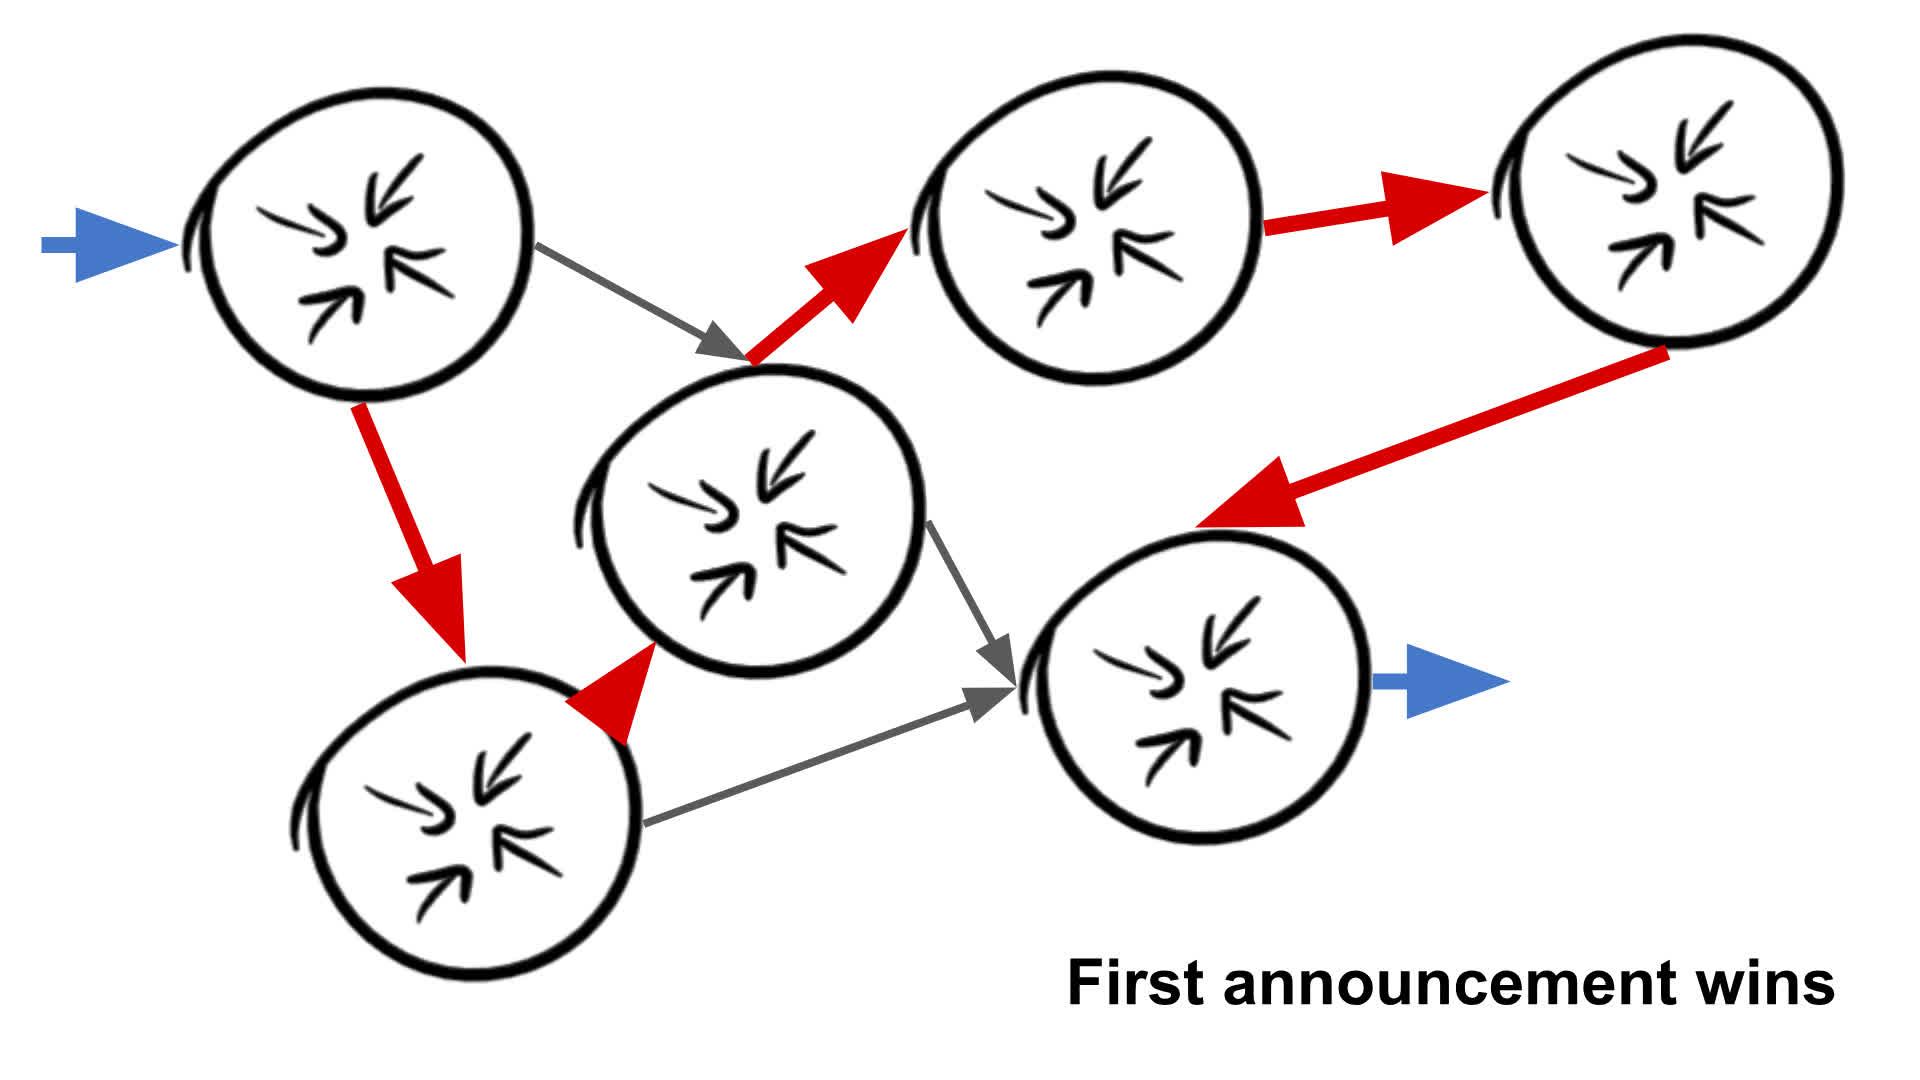 First Announcement wins diagram